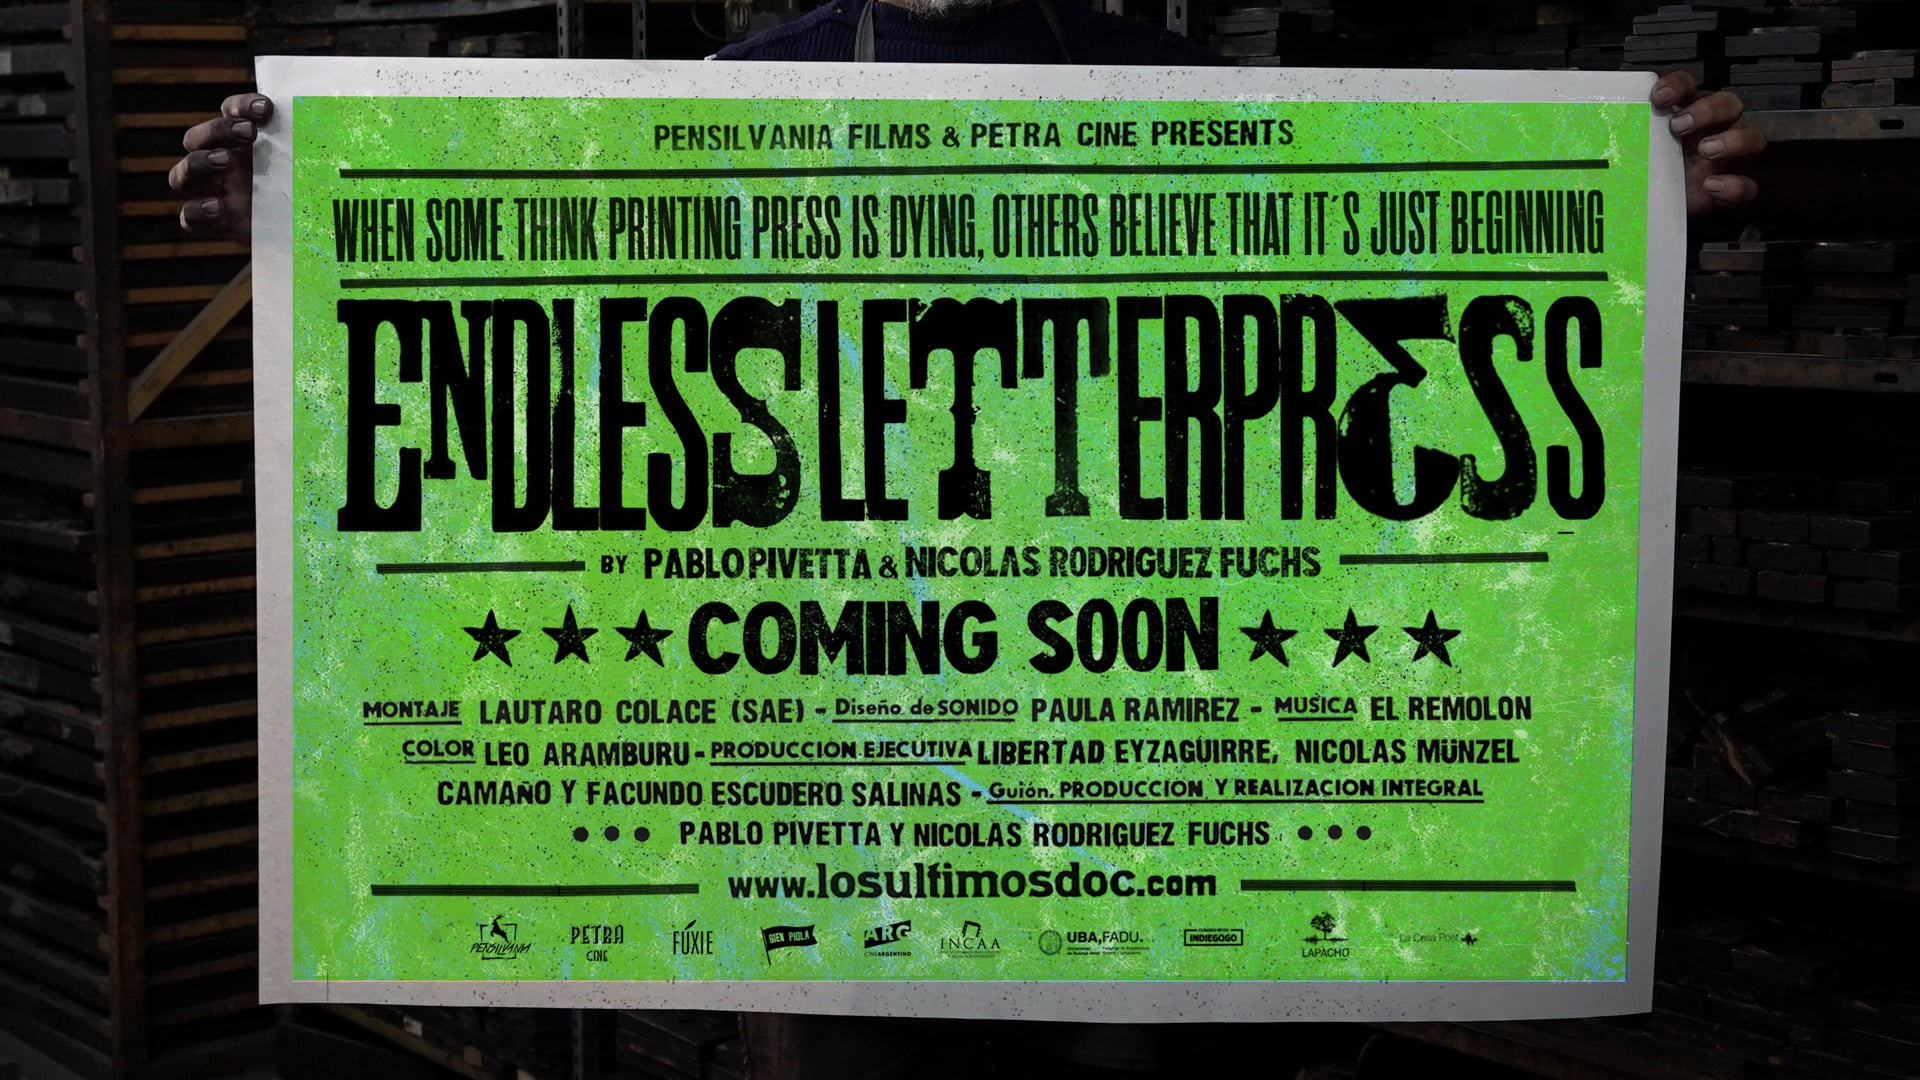 Los Ultimos / Endless Letterpress - Trailer 2018